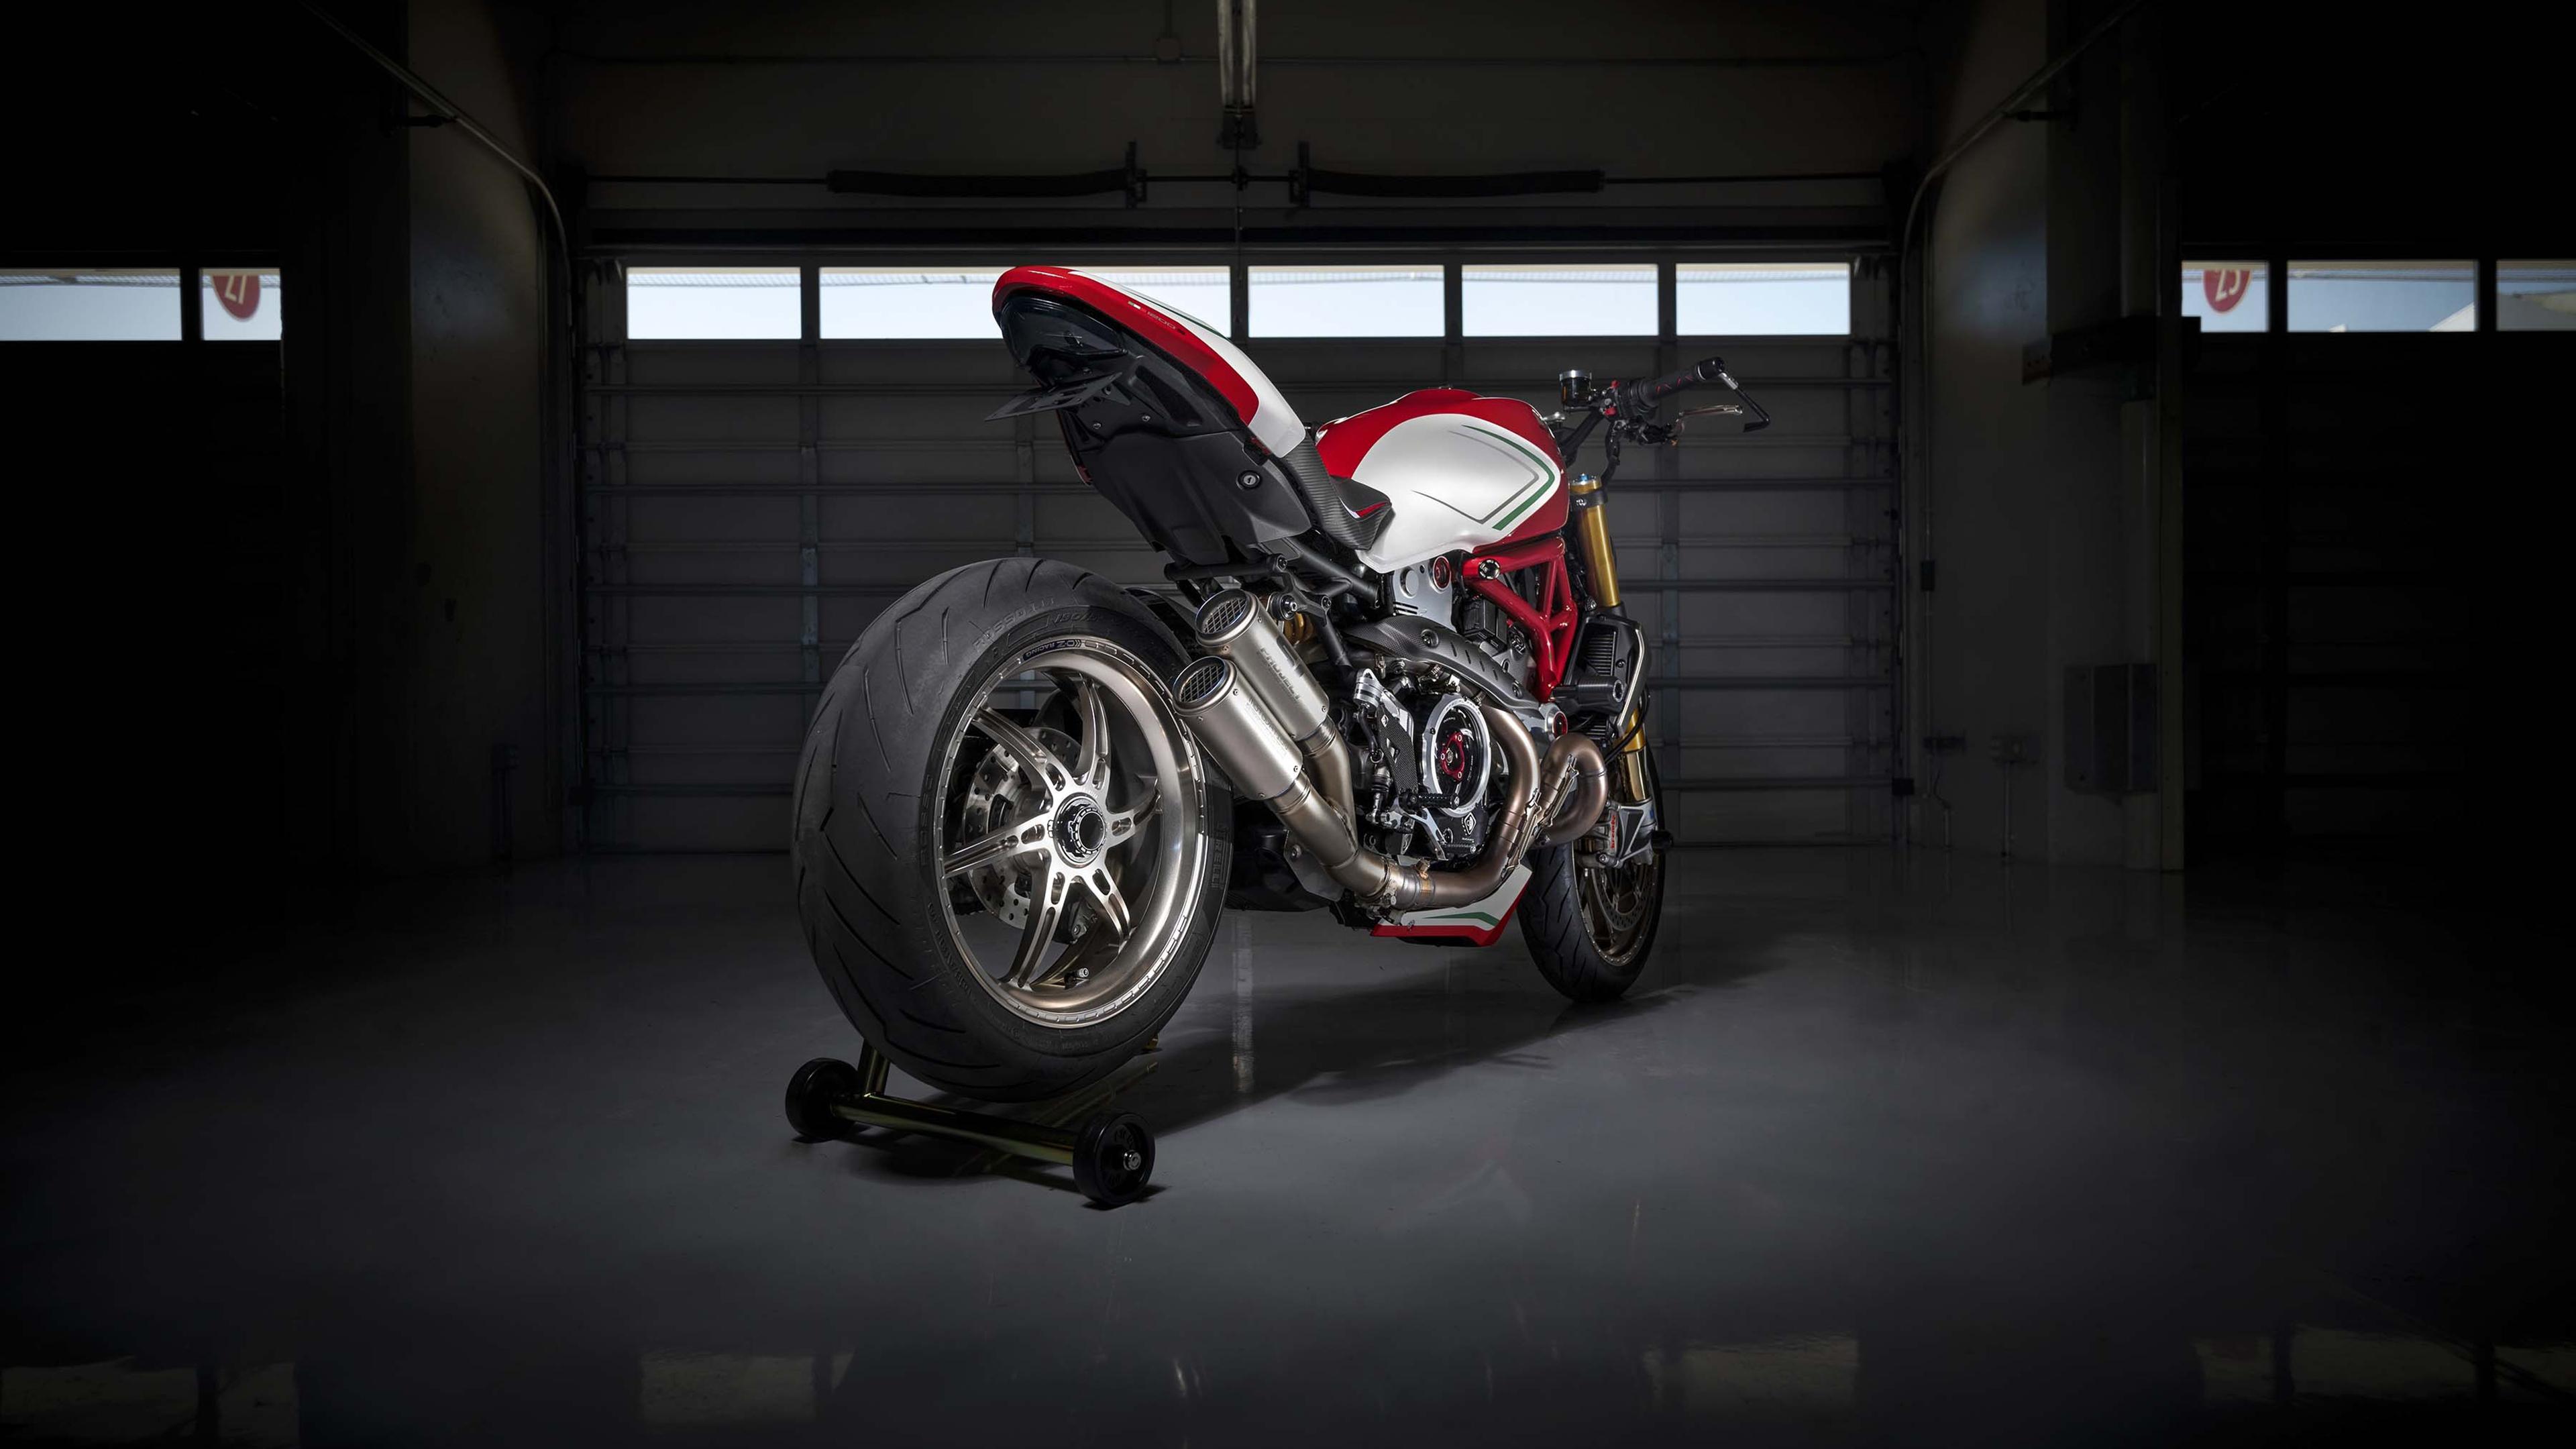 Ducati монстр 1200 триколор по мотивации 2019 обои скачать